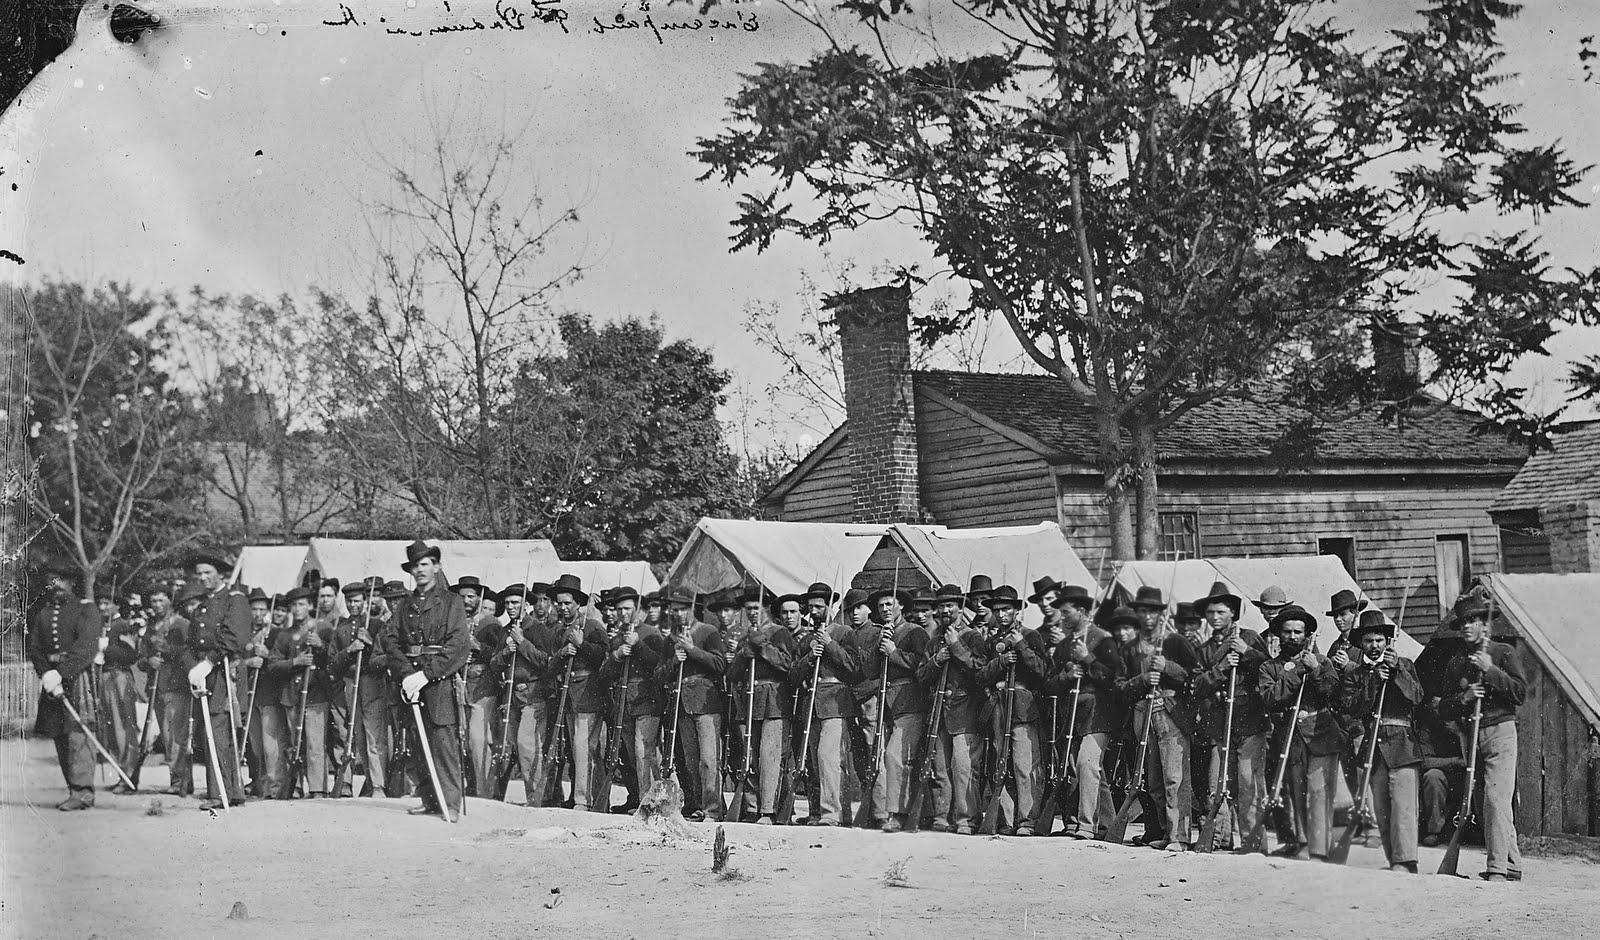 pennsylvania army